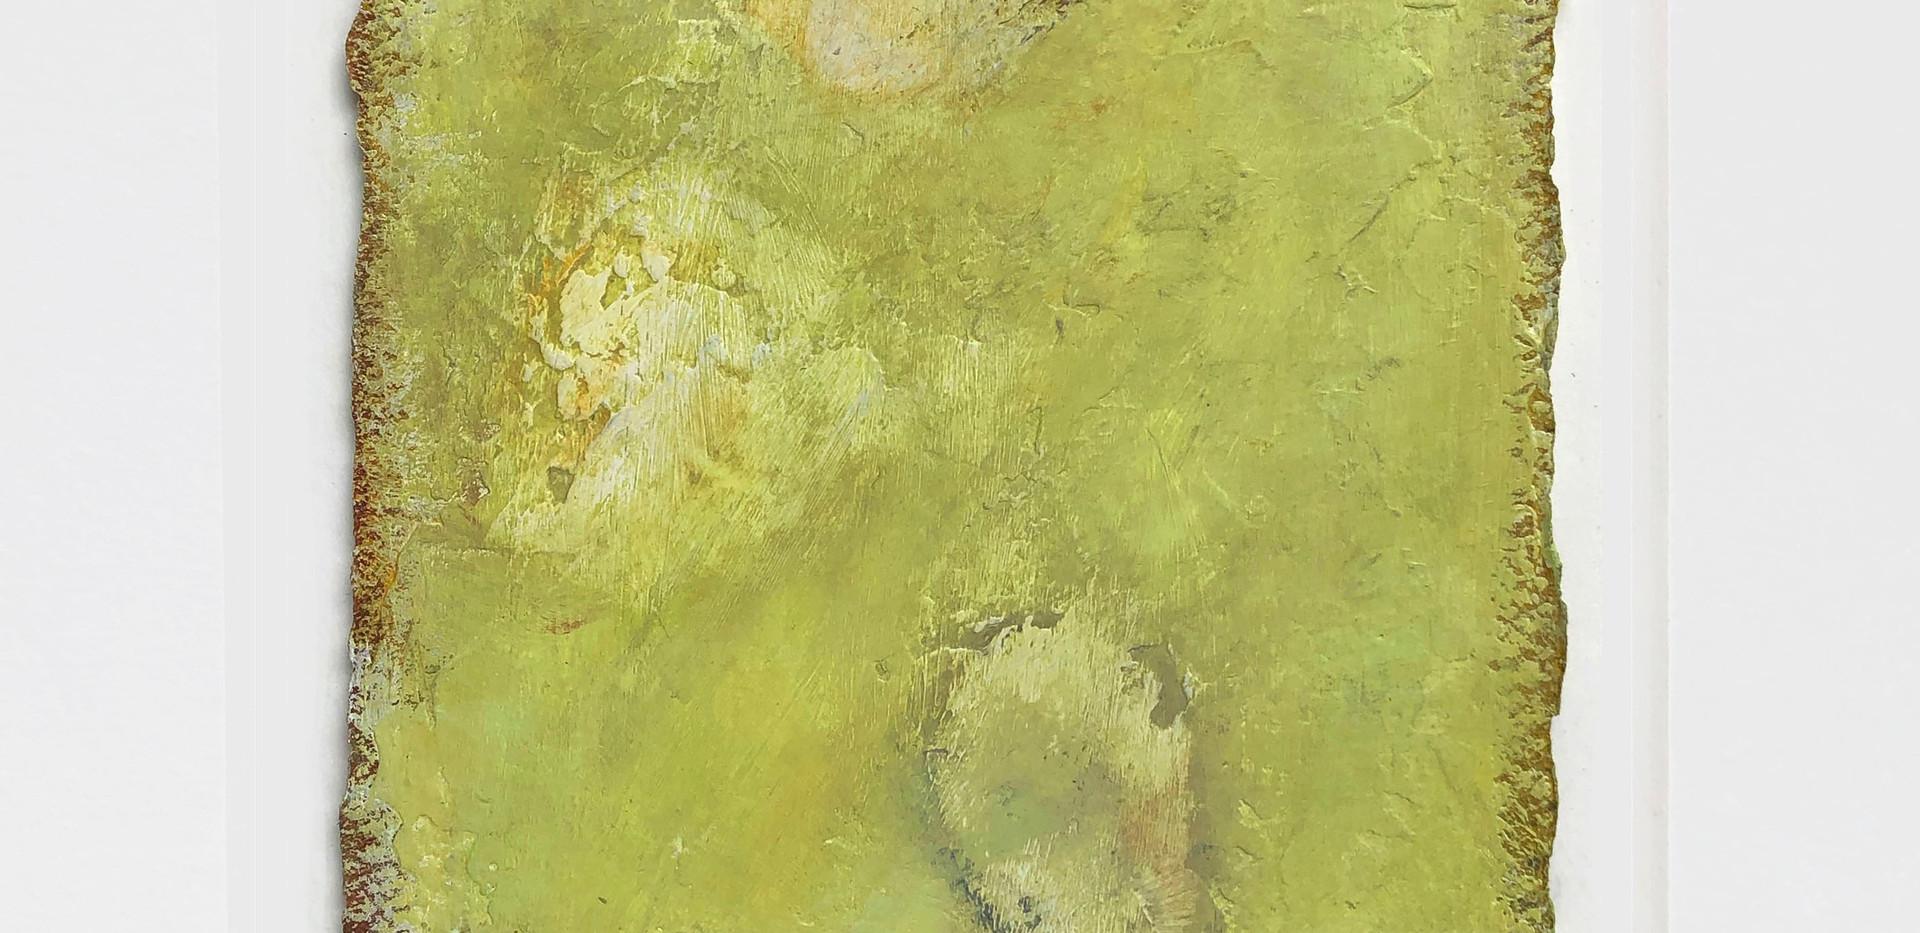 Marc Zaref_Tide pool study_color_05.jpg